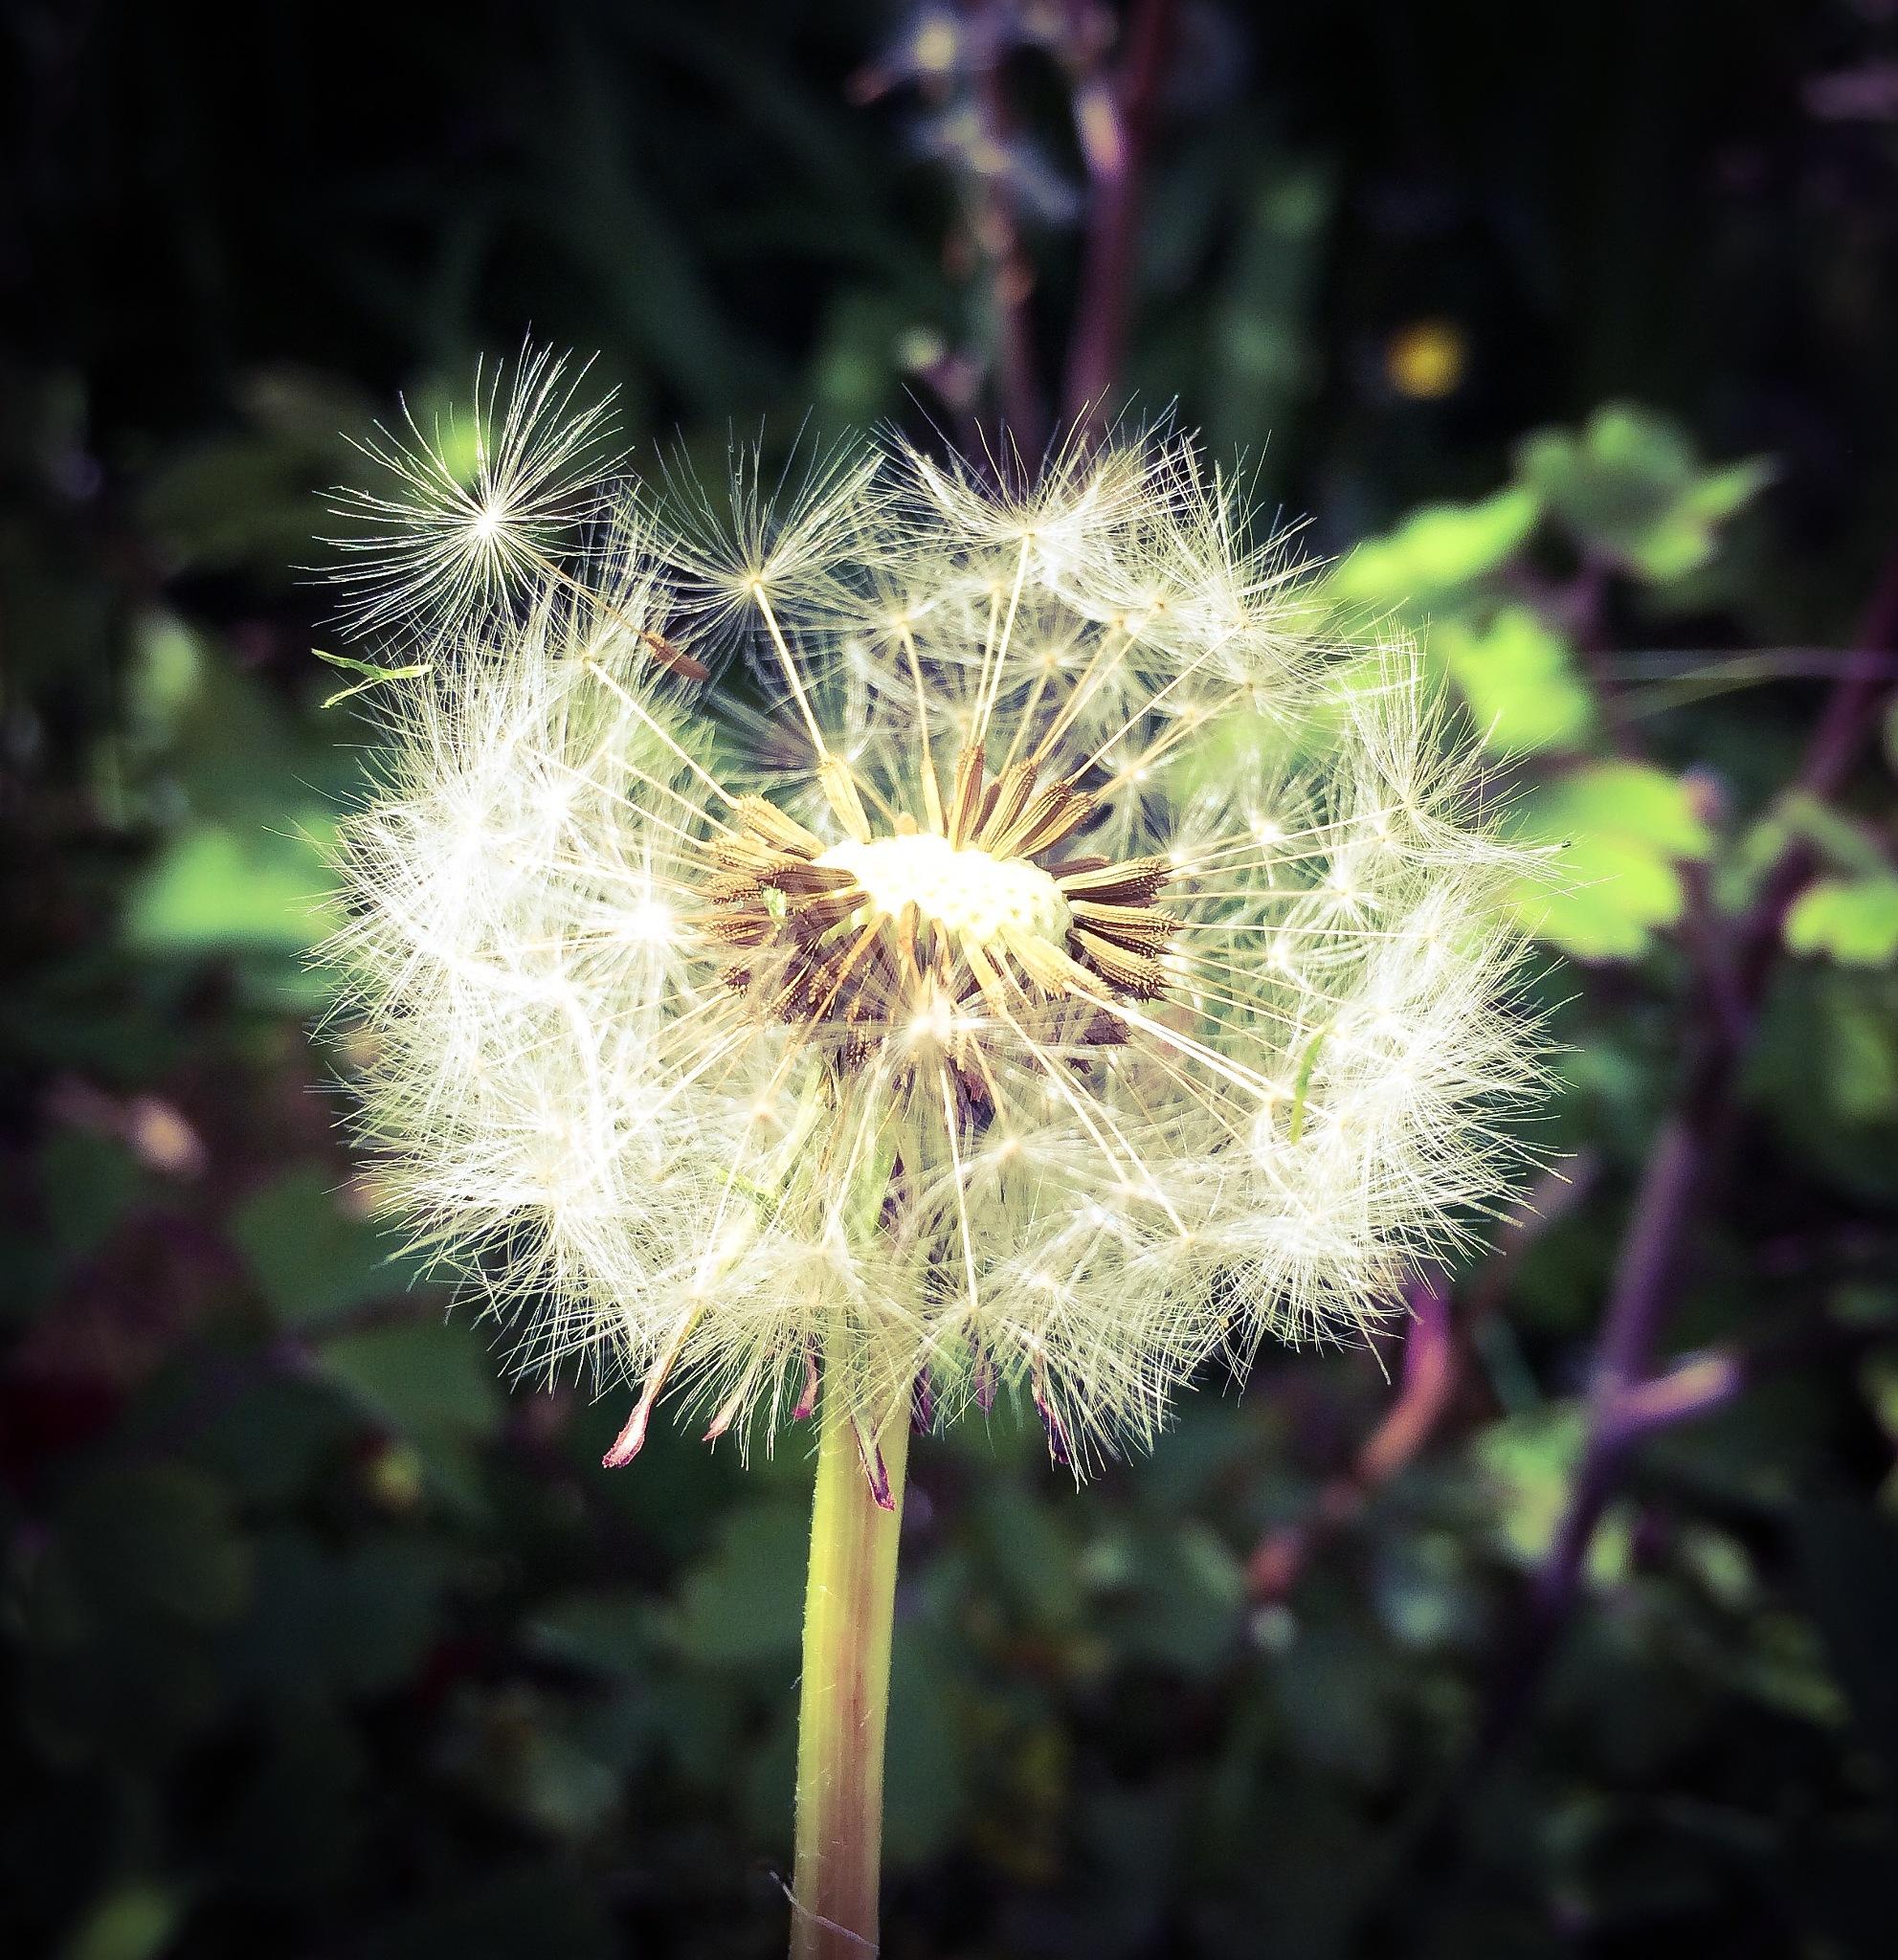 Make a wish by Kevin Ward